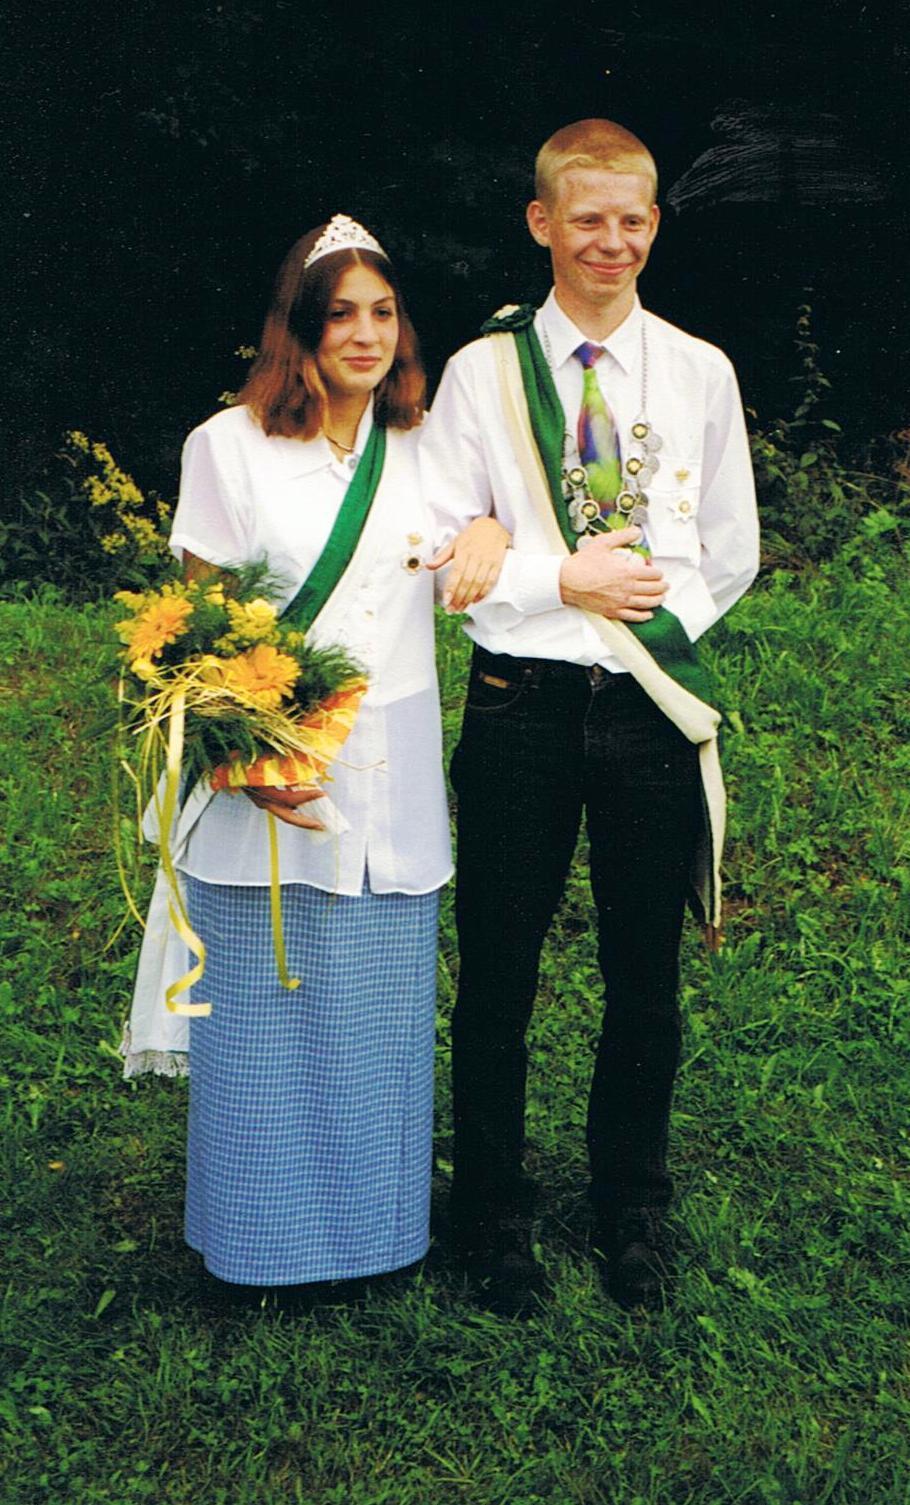 Jungschützenkönigspaar 1998: Mirko Wick und Daniela Schneider